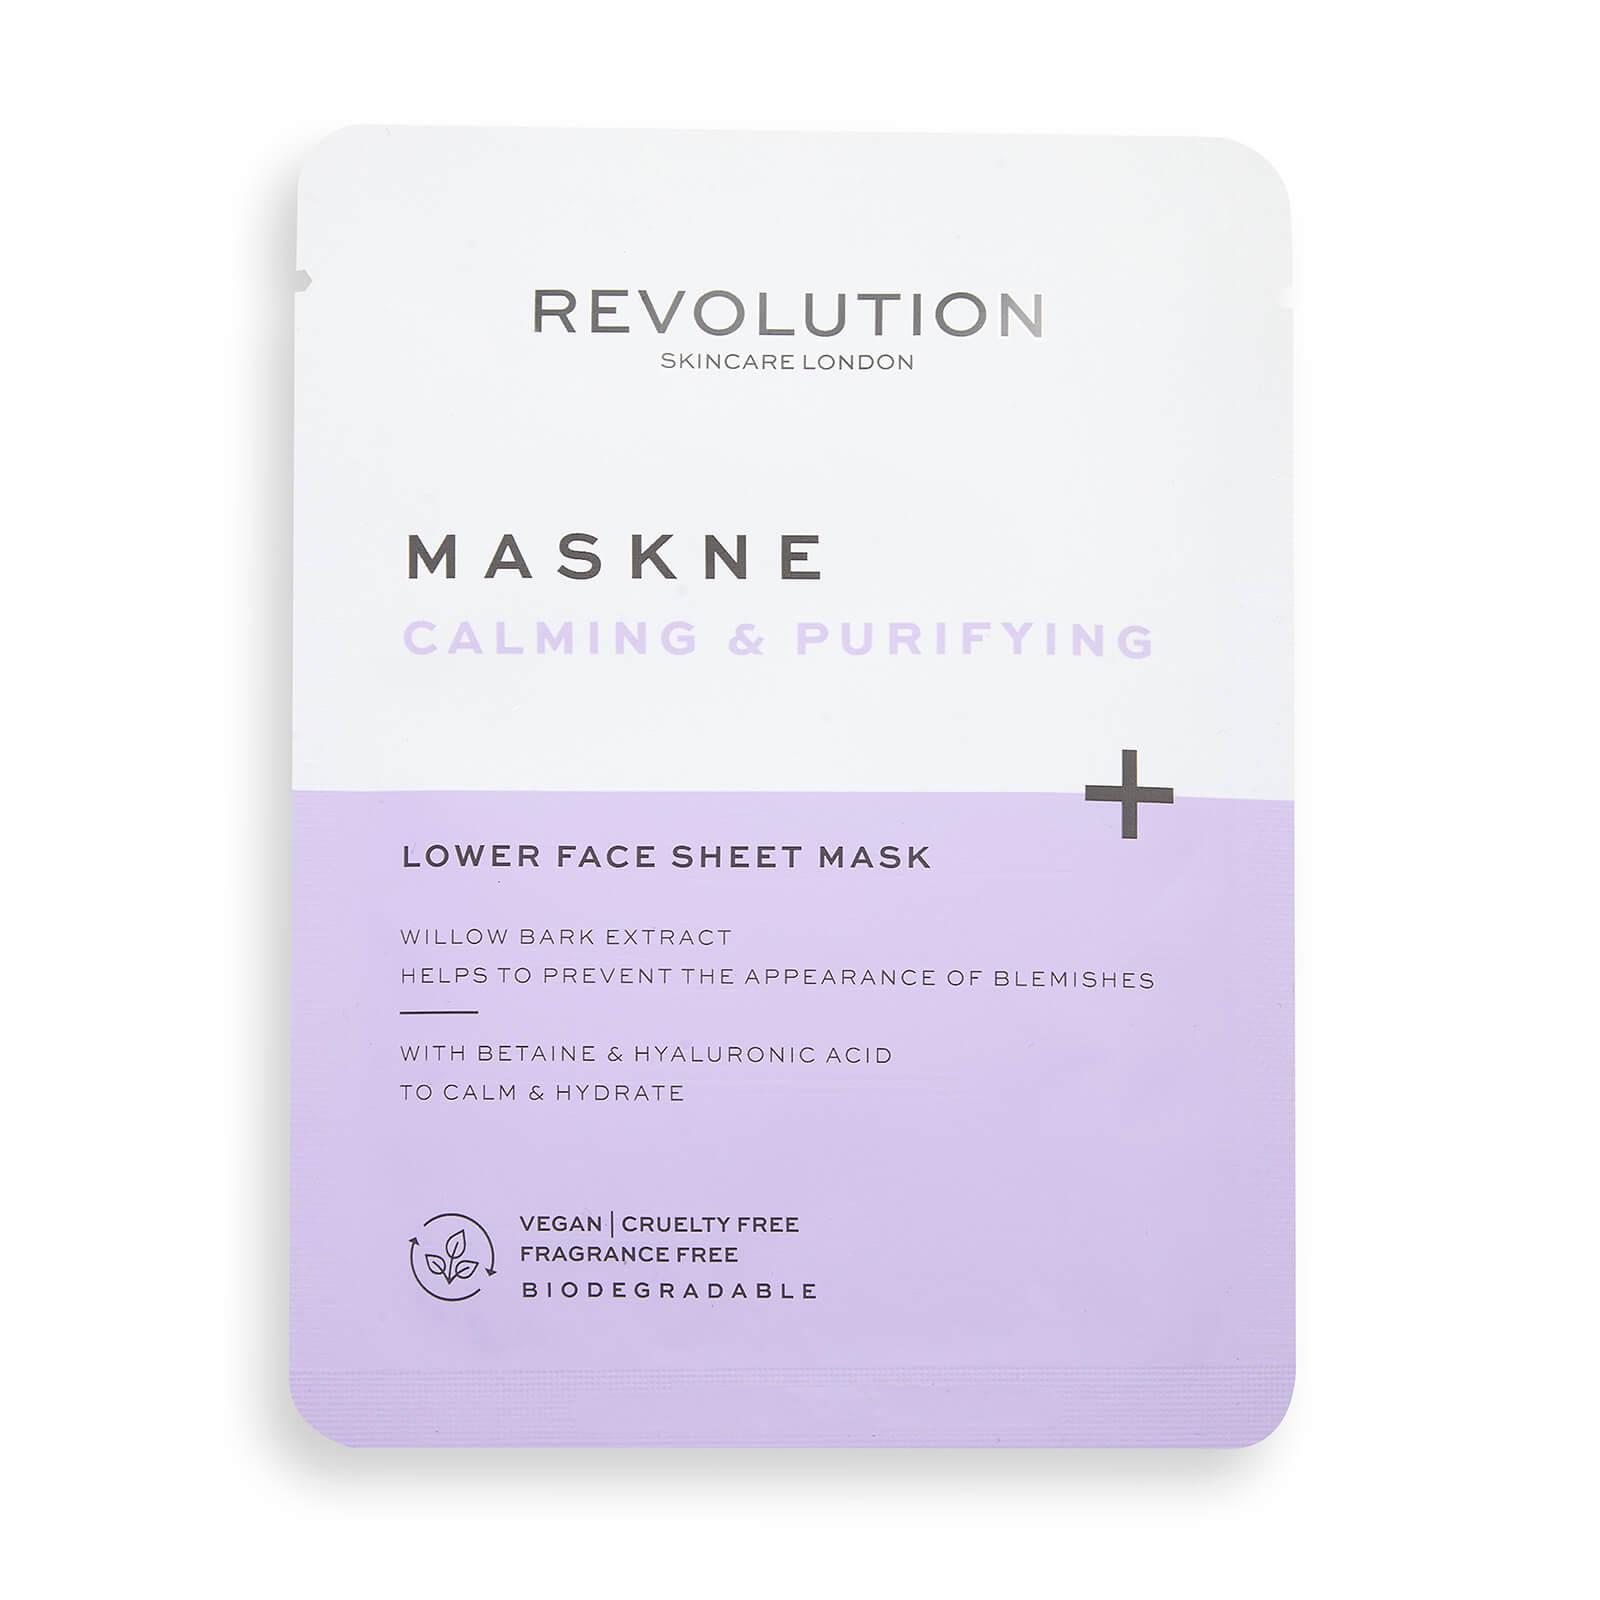 Купить Revolution Skincare Maskcare Maskne Calming & Purifying Lower Face Sheet Mask